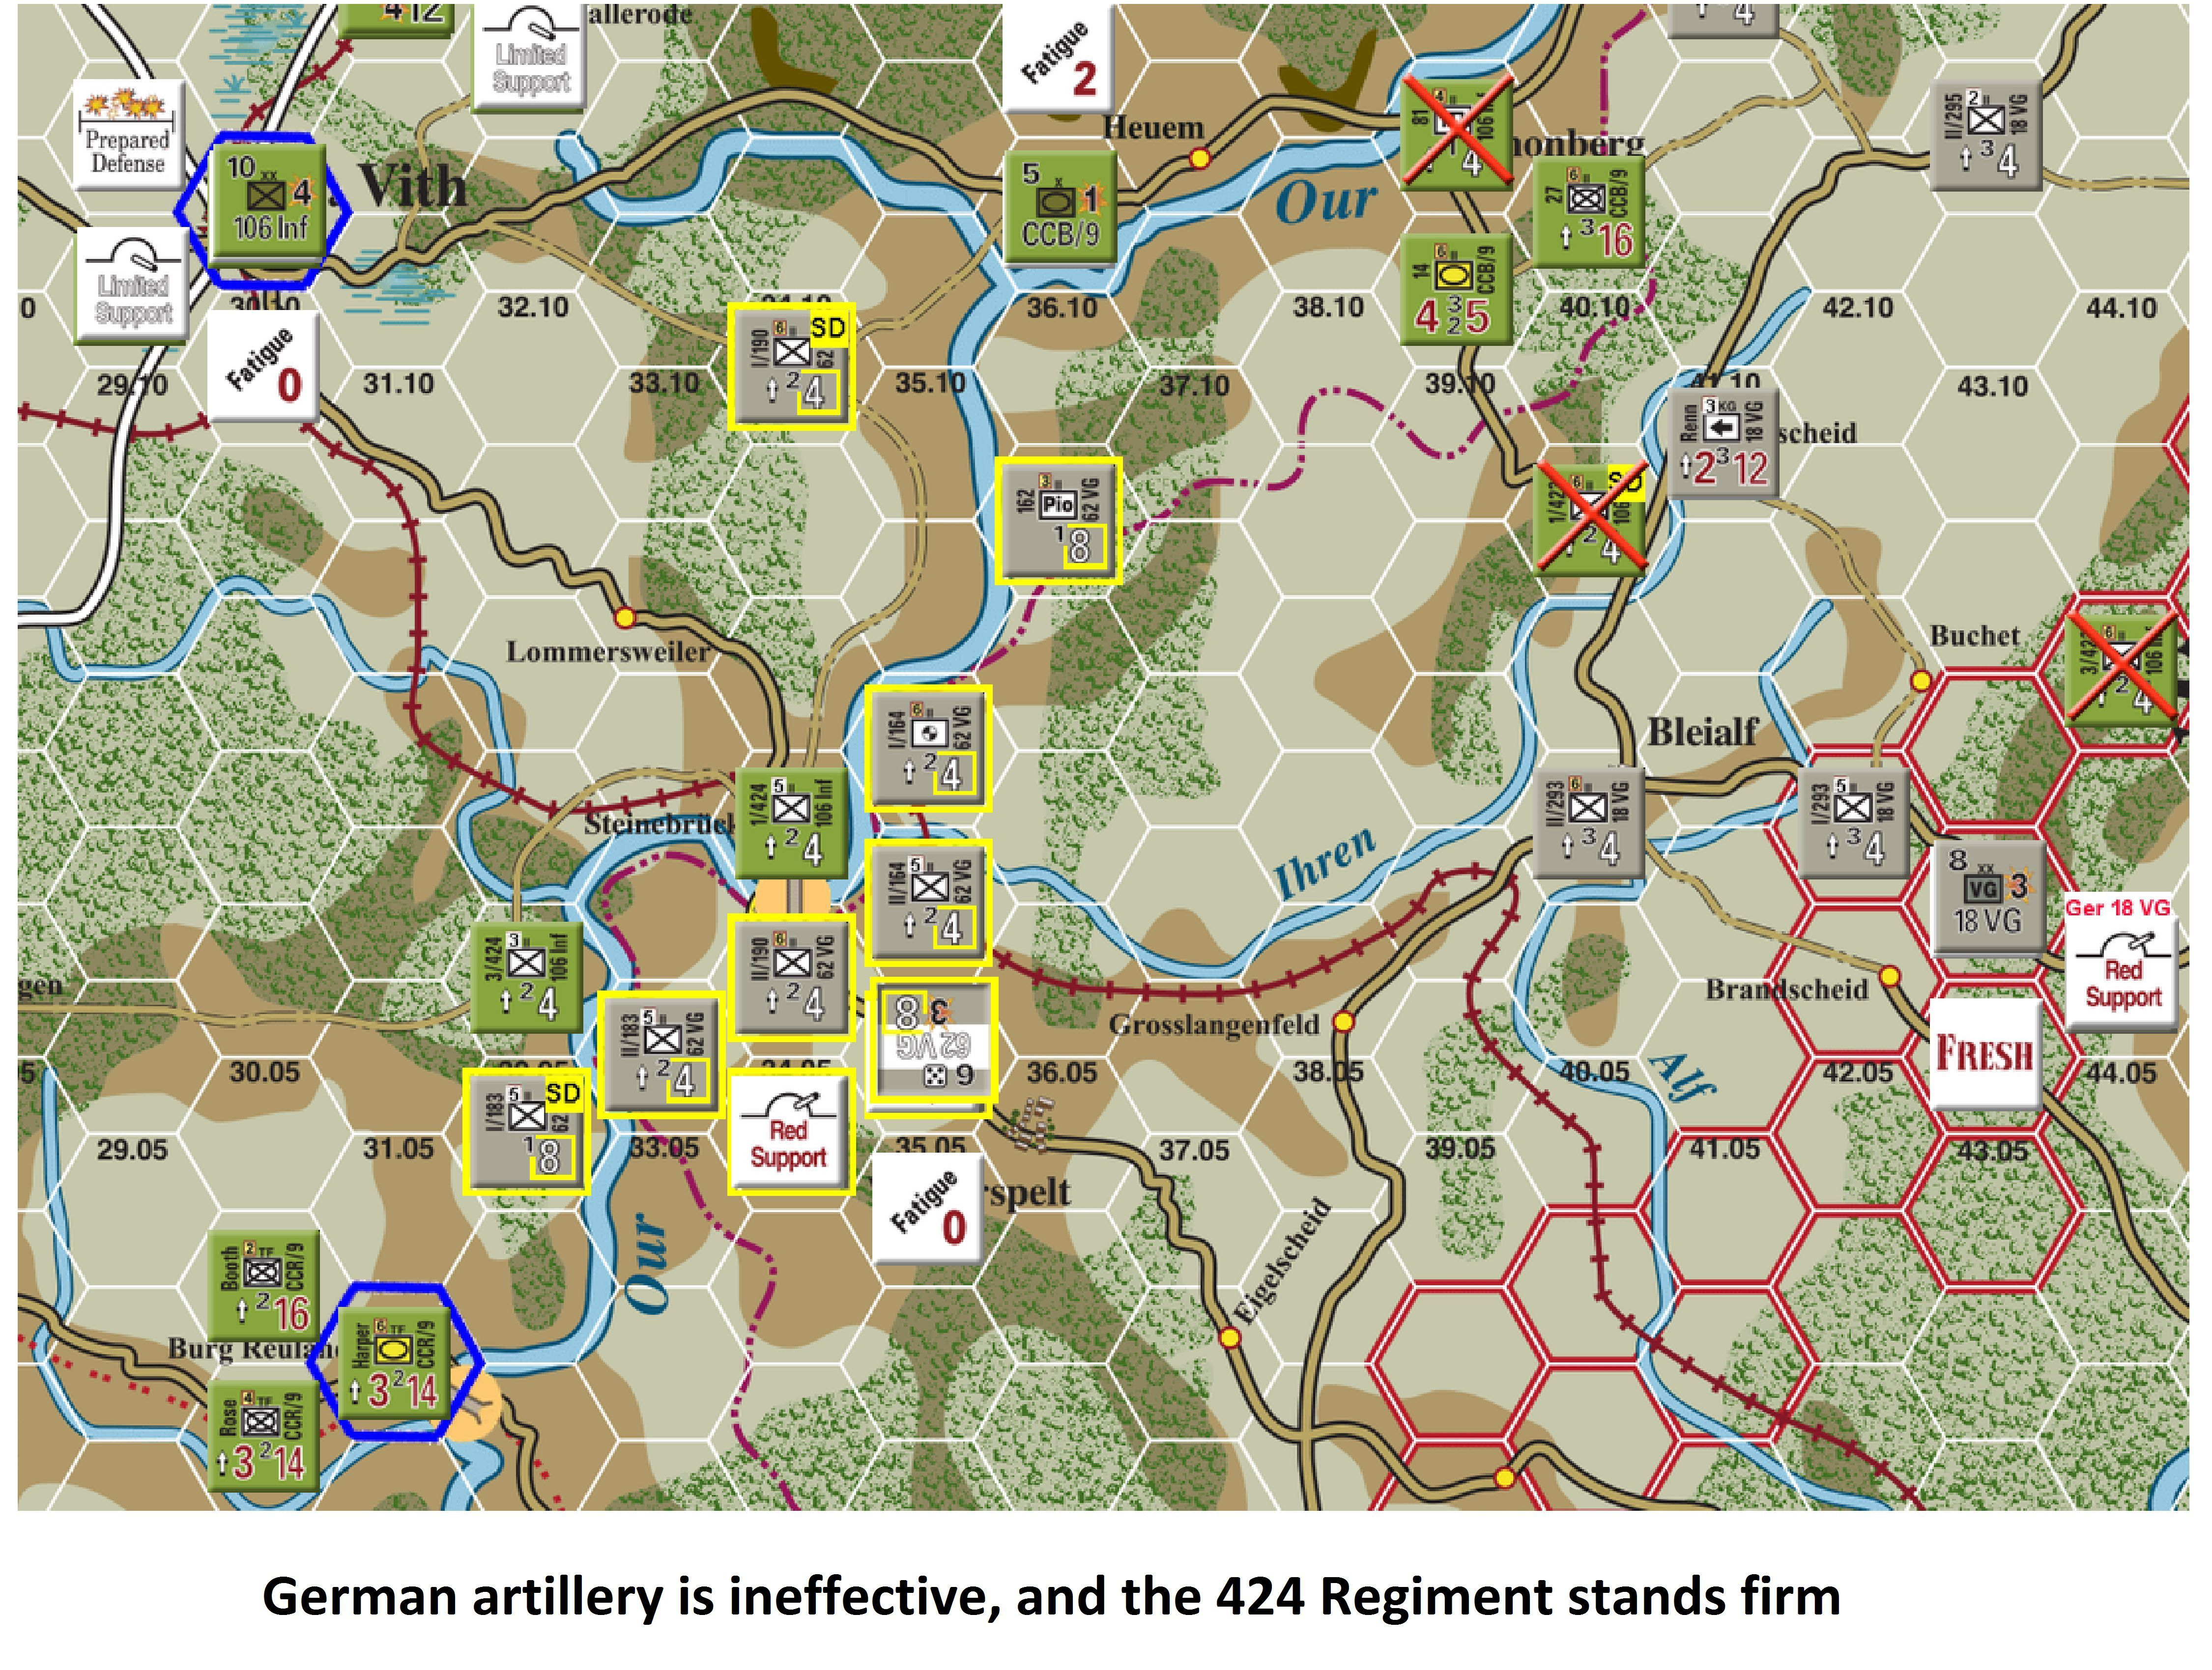 Rutan's Full Campaign AAR - Day 2 | Last Blitzkrieg